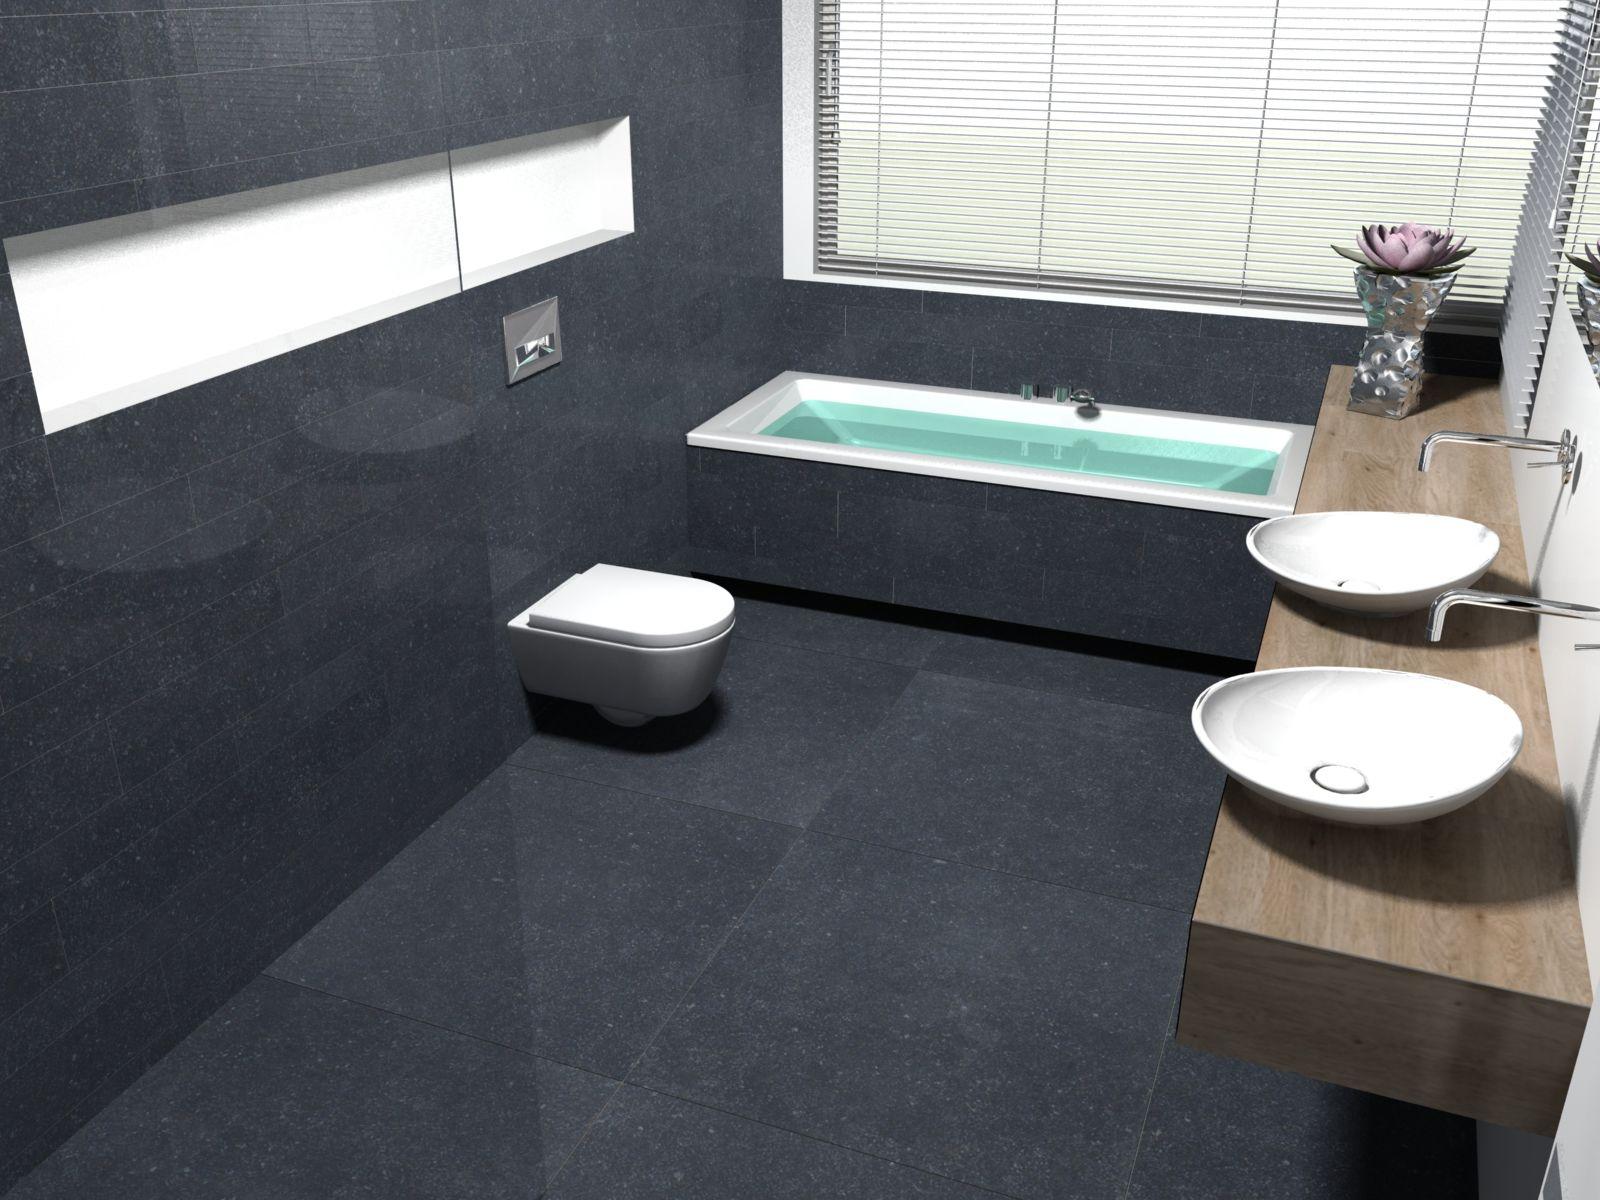 zwevend bad badezimmer pinterest bad badkamer en badkamers